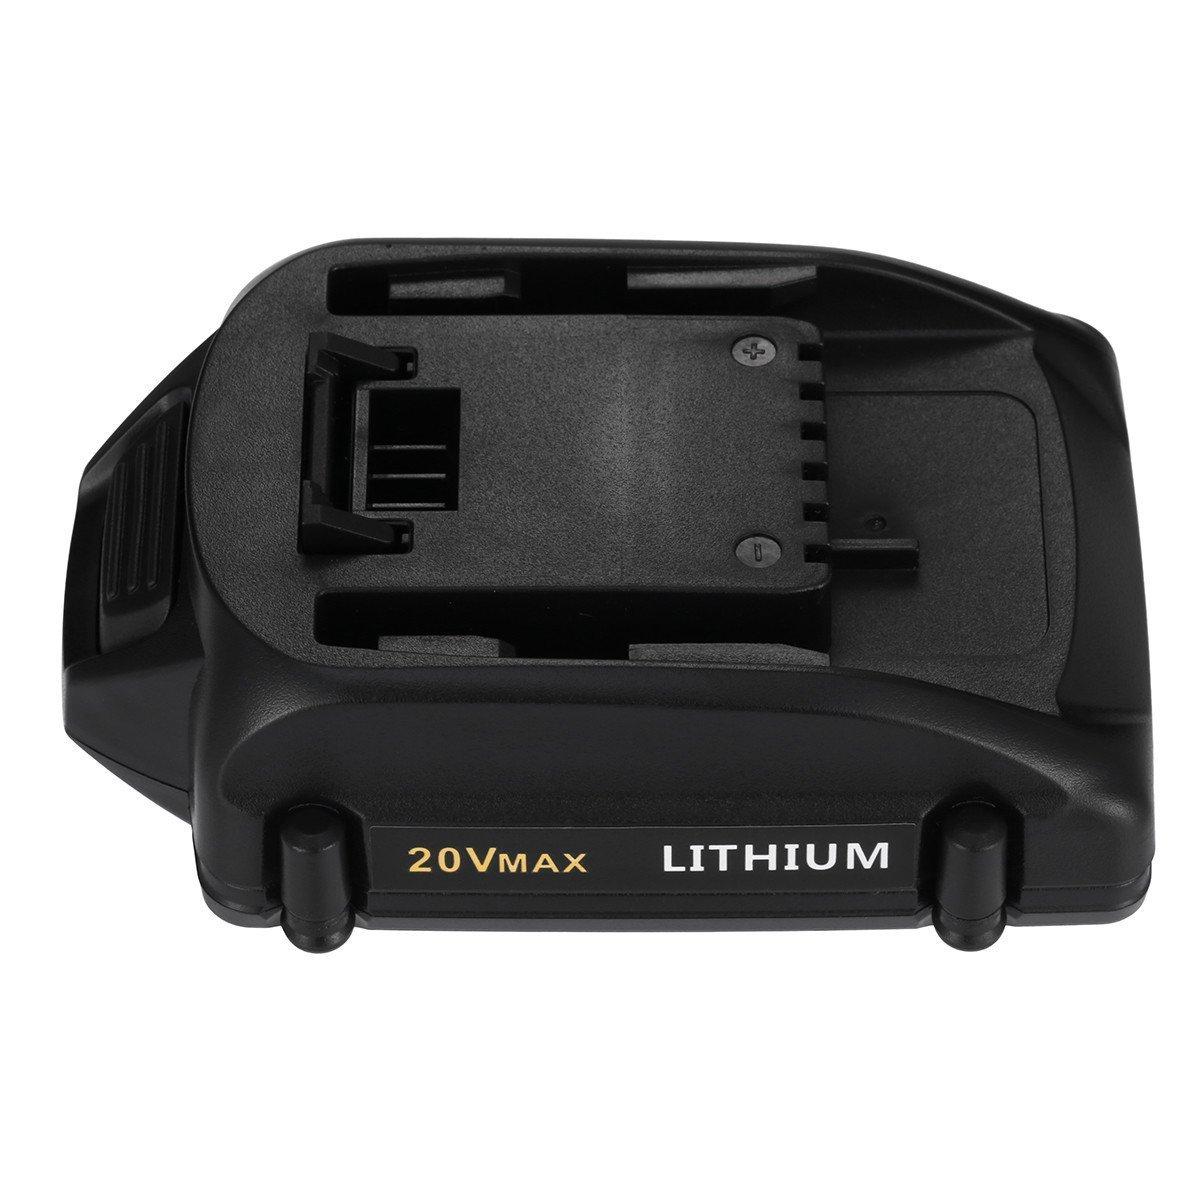 Powerextra 2.5Ah Worx 20 Volt Lithium WA3520 Replacement Battery for WORX WG151s, WG155s, WG251s, WG540s, WG890, WG891 Worx 20v Lithium Battery